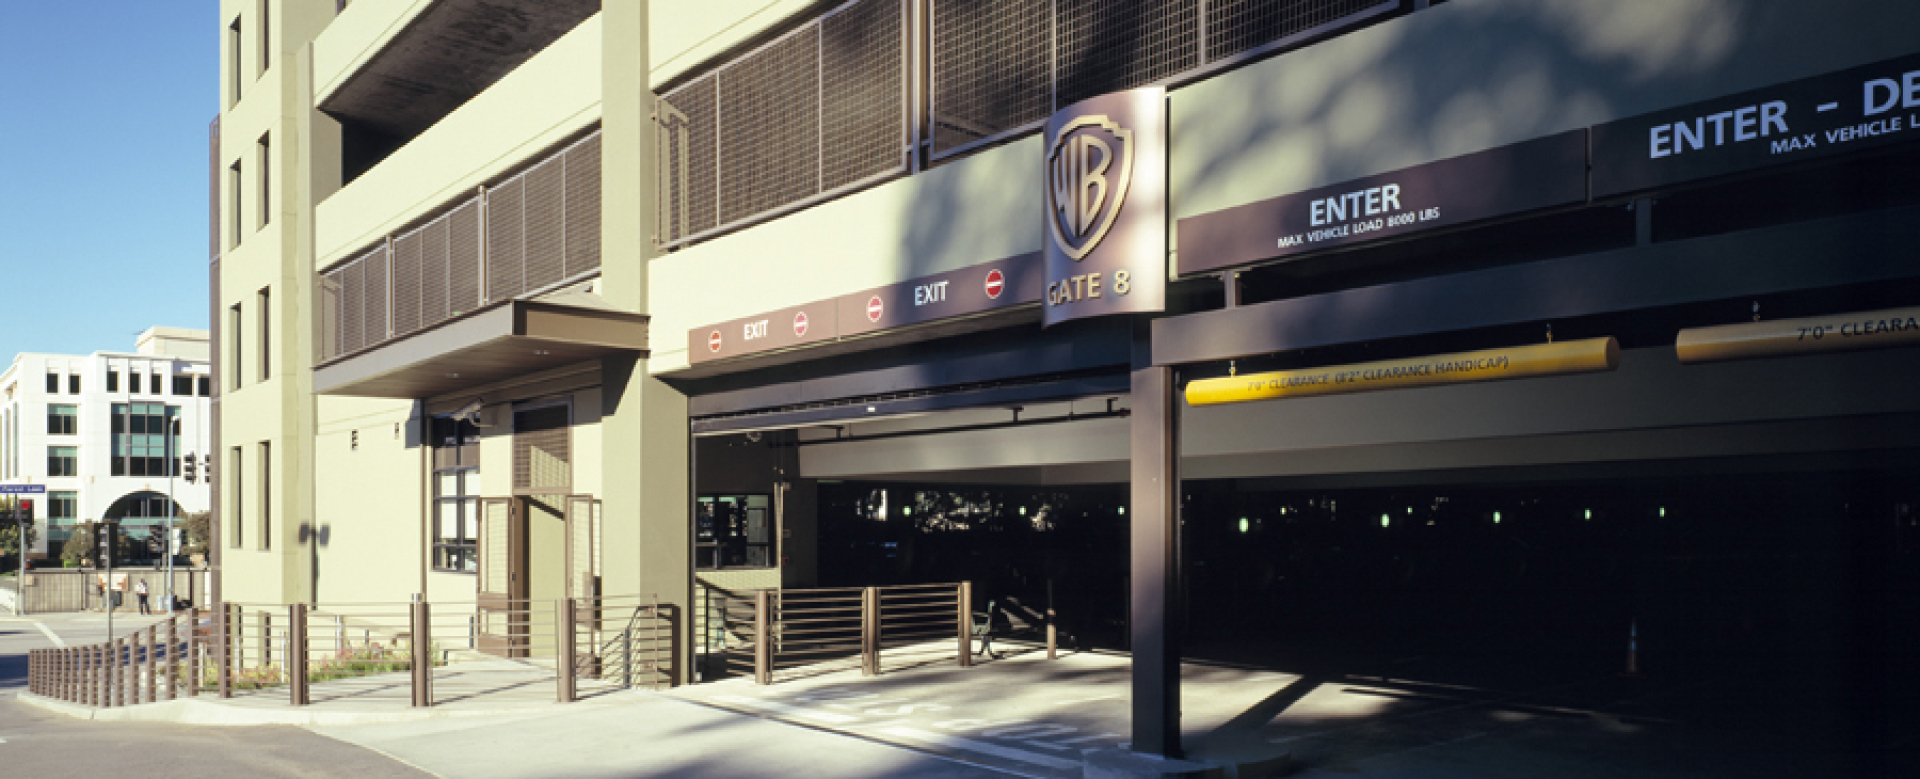 Warner Bros. Forest Lawn Parking Structure